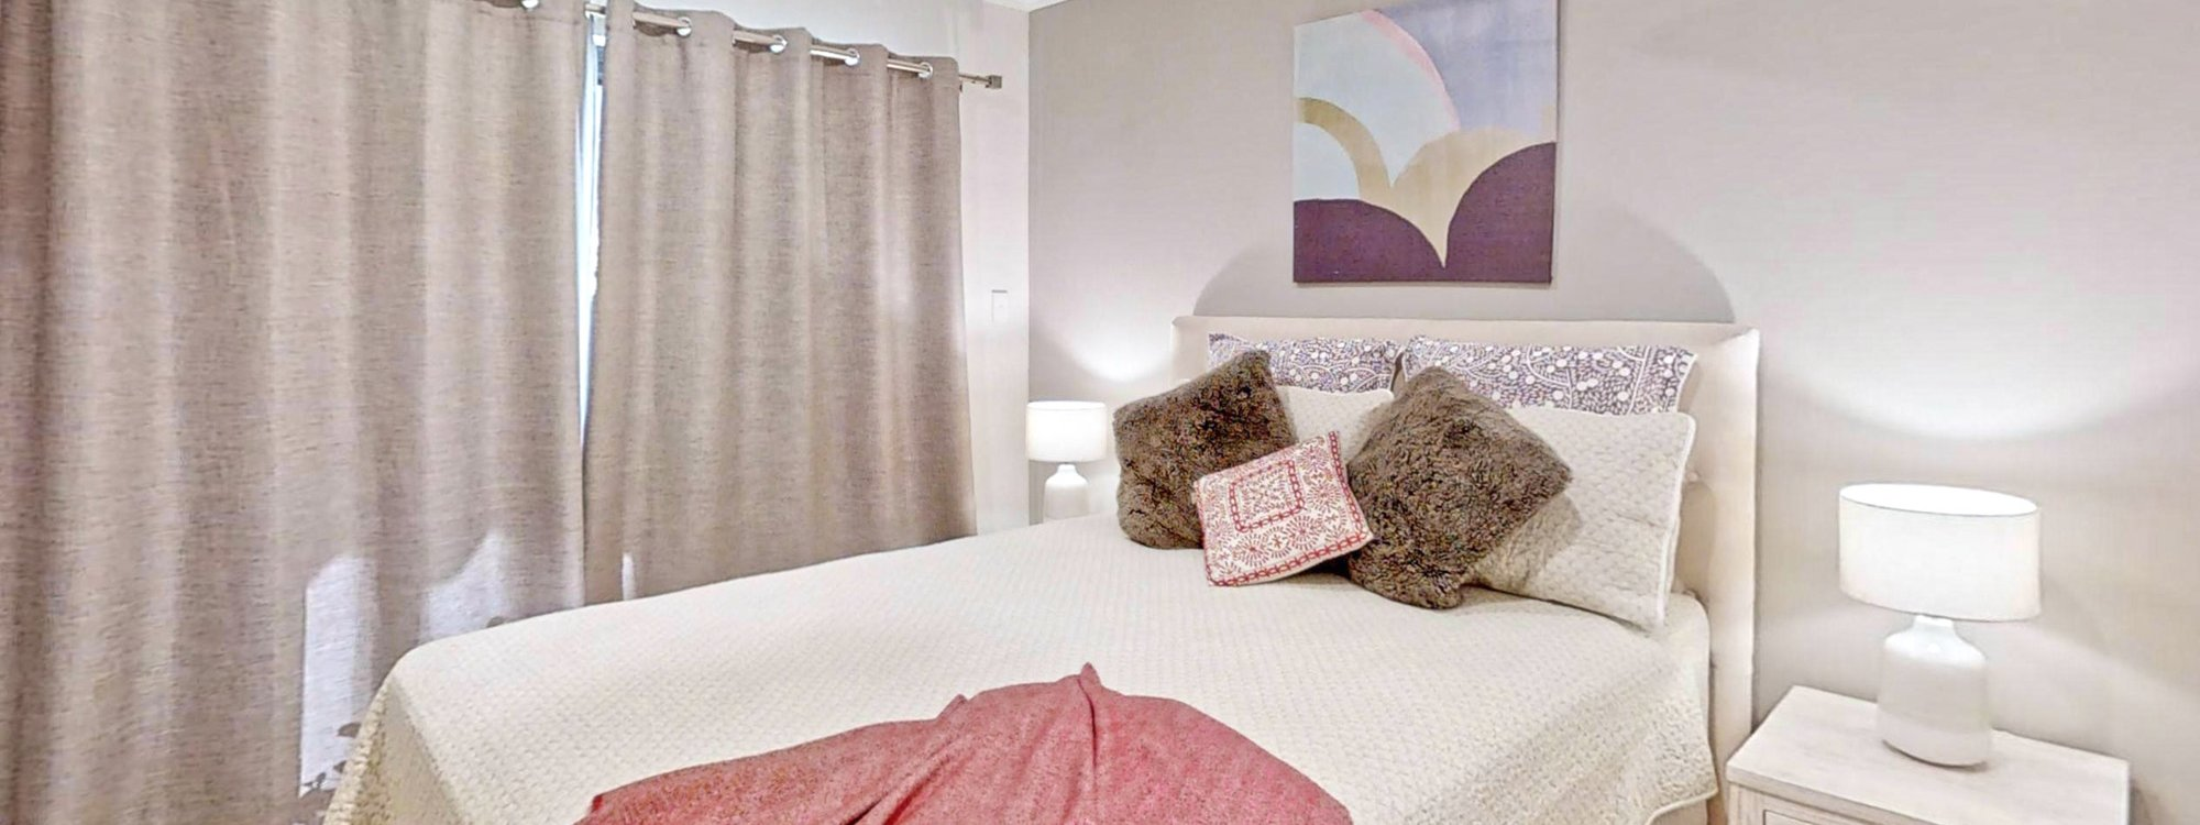 Sunnyside Up - Byron Bay - Bedroom 2b